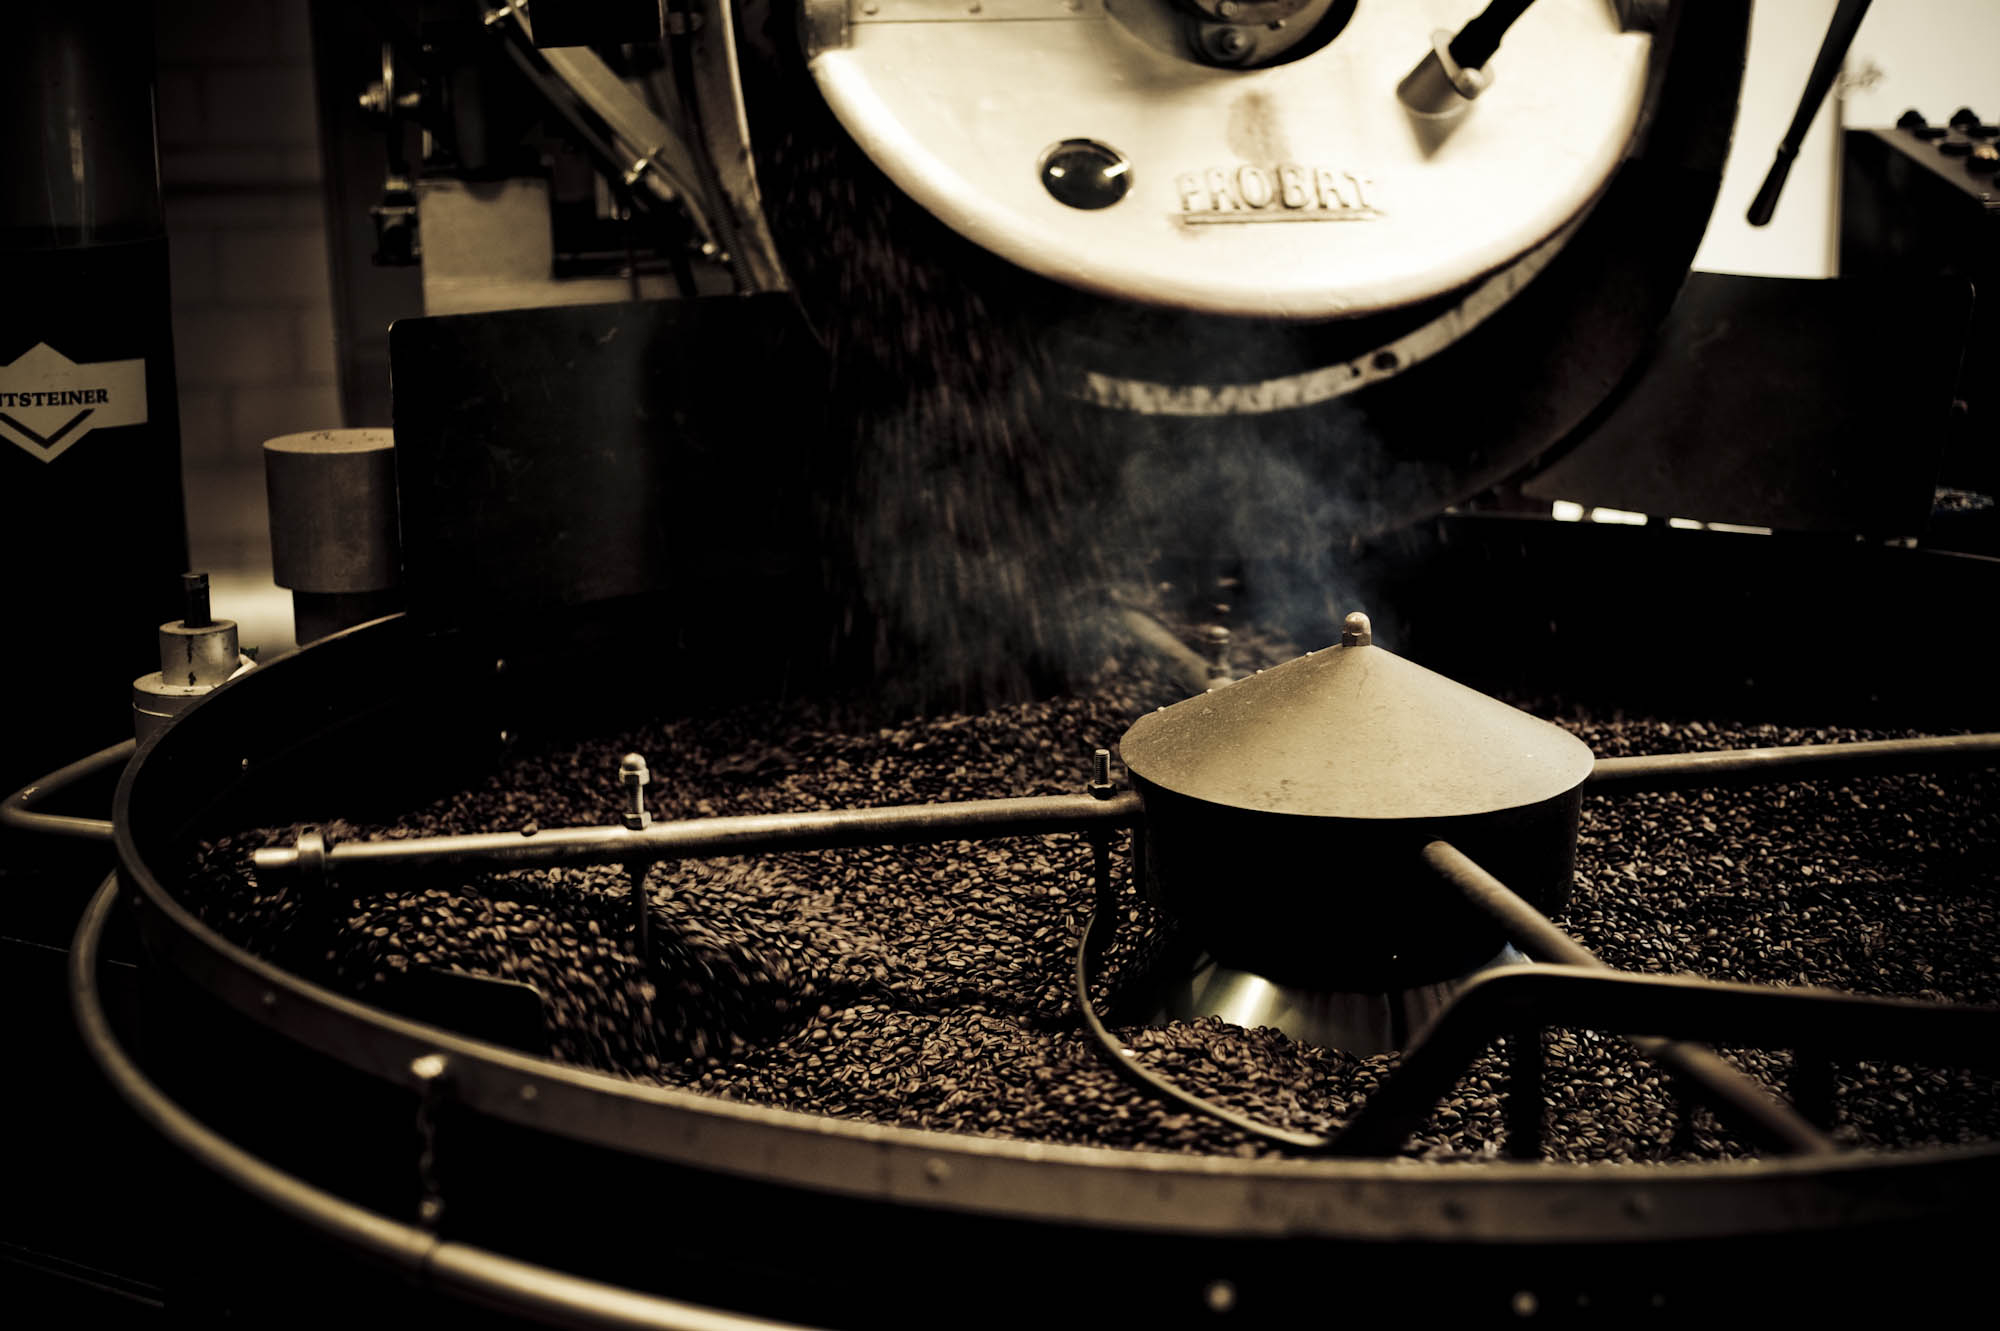 Die höchstgelegene Kaffe-Rösterei Europas